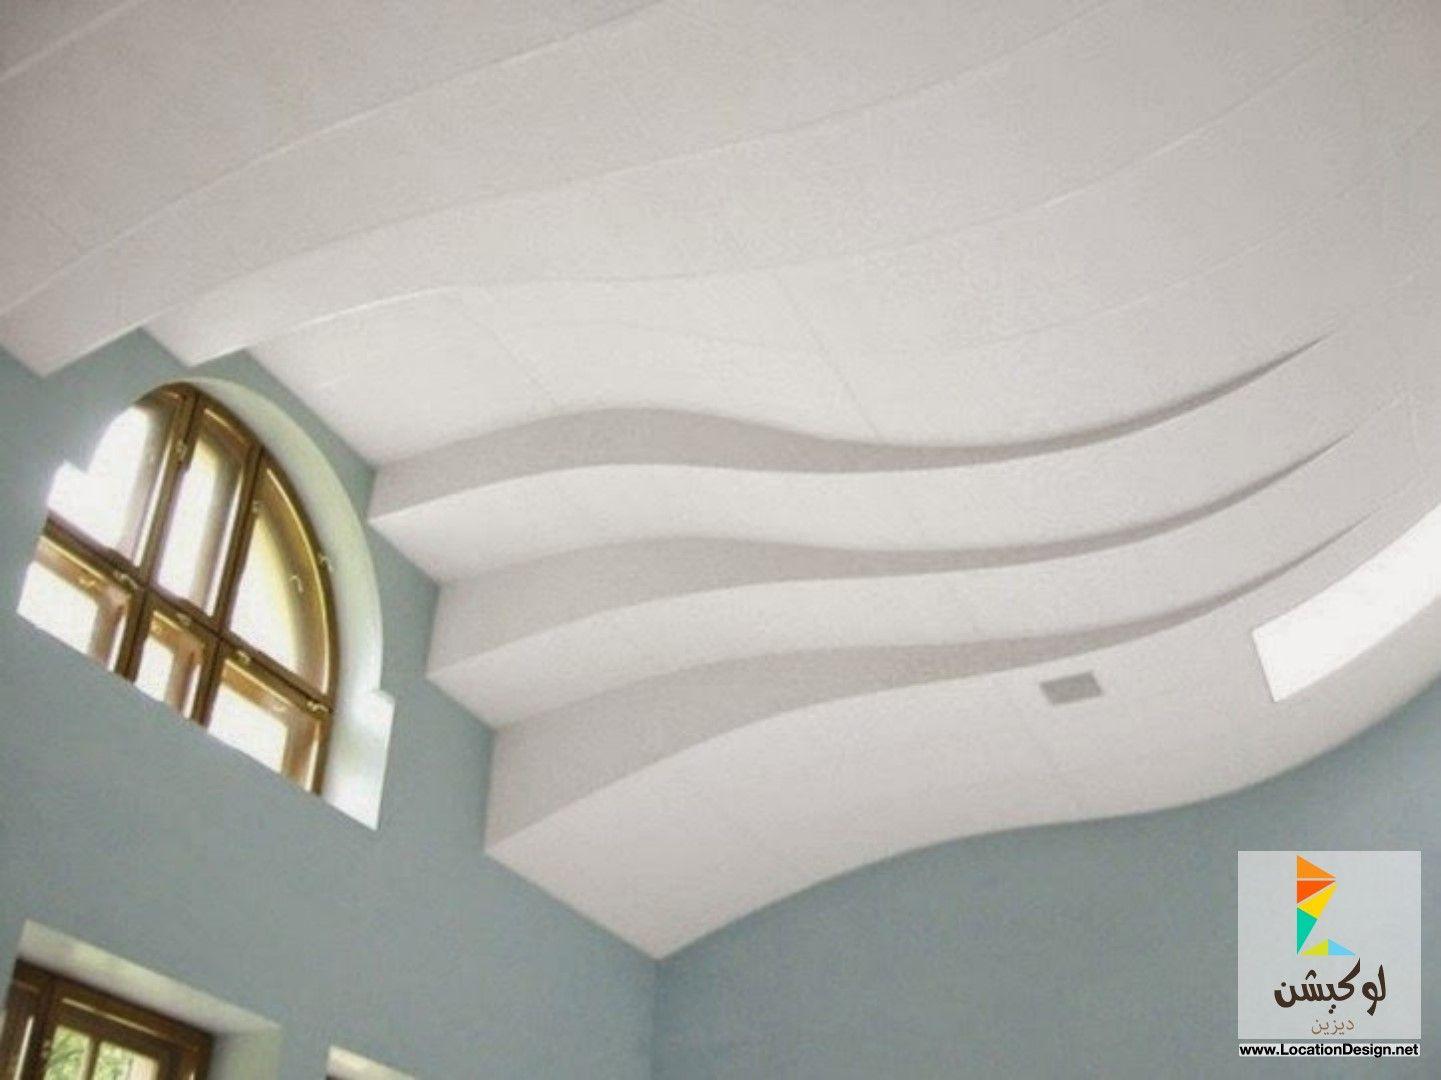 pinterest sound absorbing glass wool ceiling tiles ecophon focus flexiform by saint gobain ecophon dailygadgetfo Images